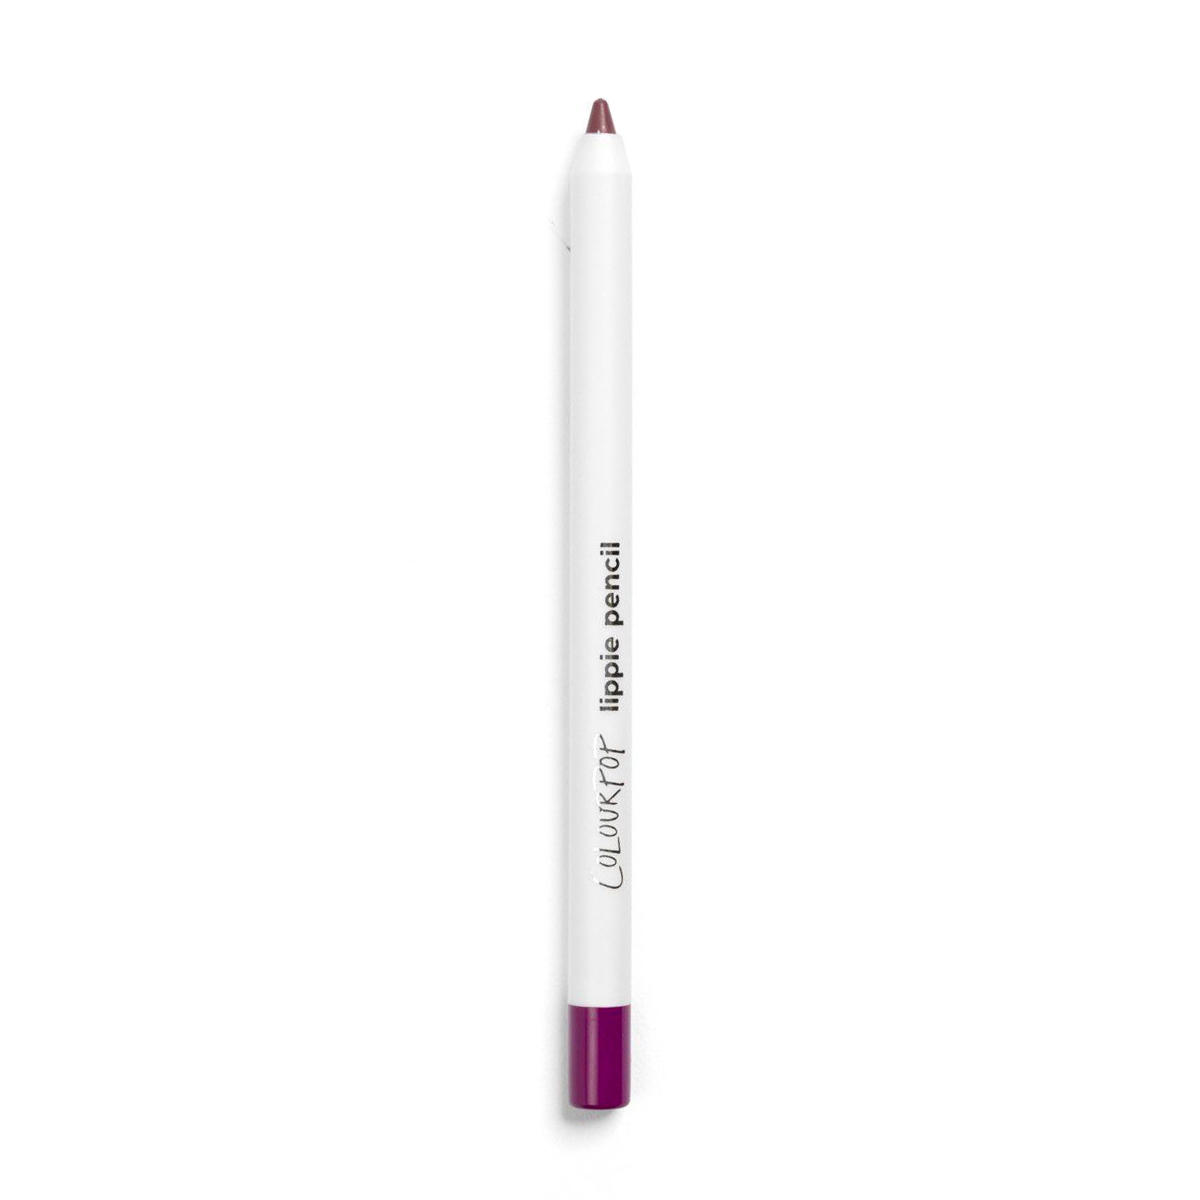 ColourPop Lippie Pencil Flattered